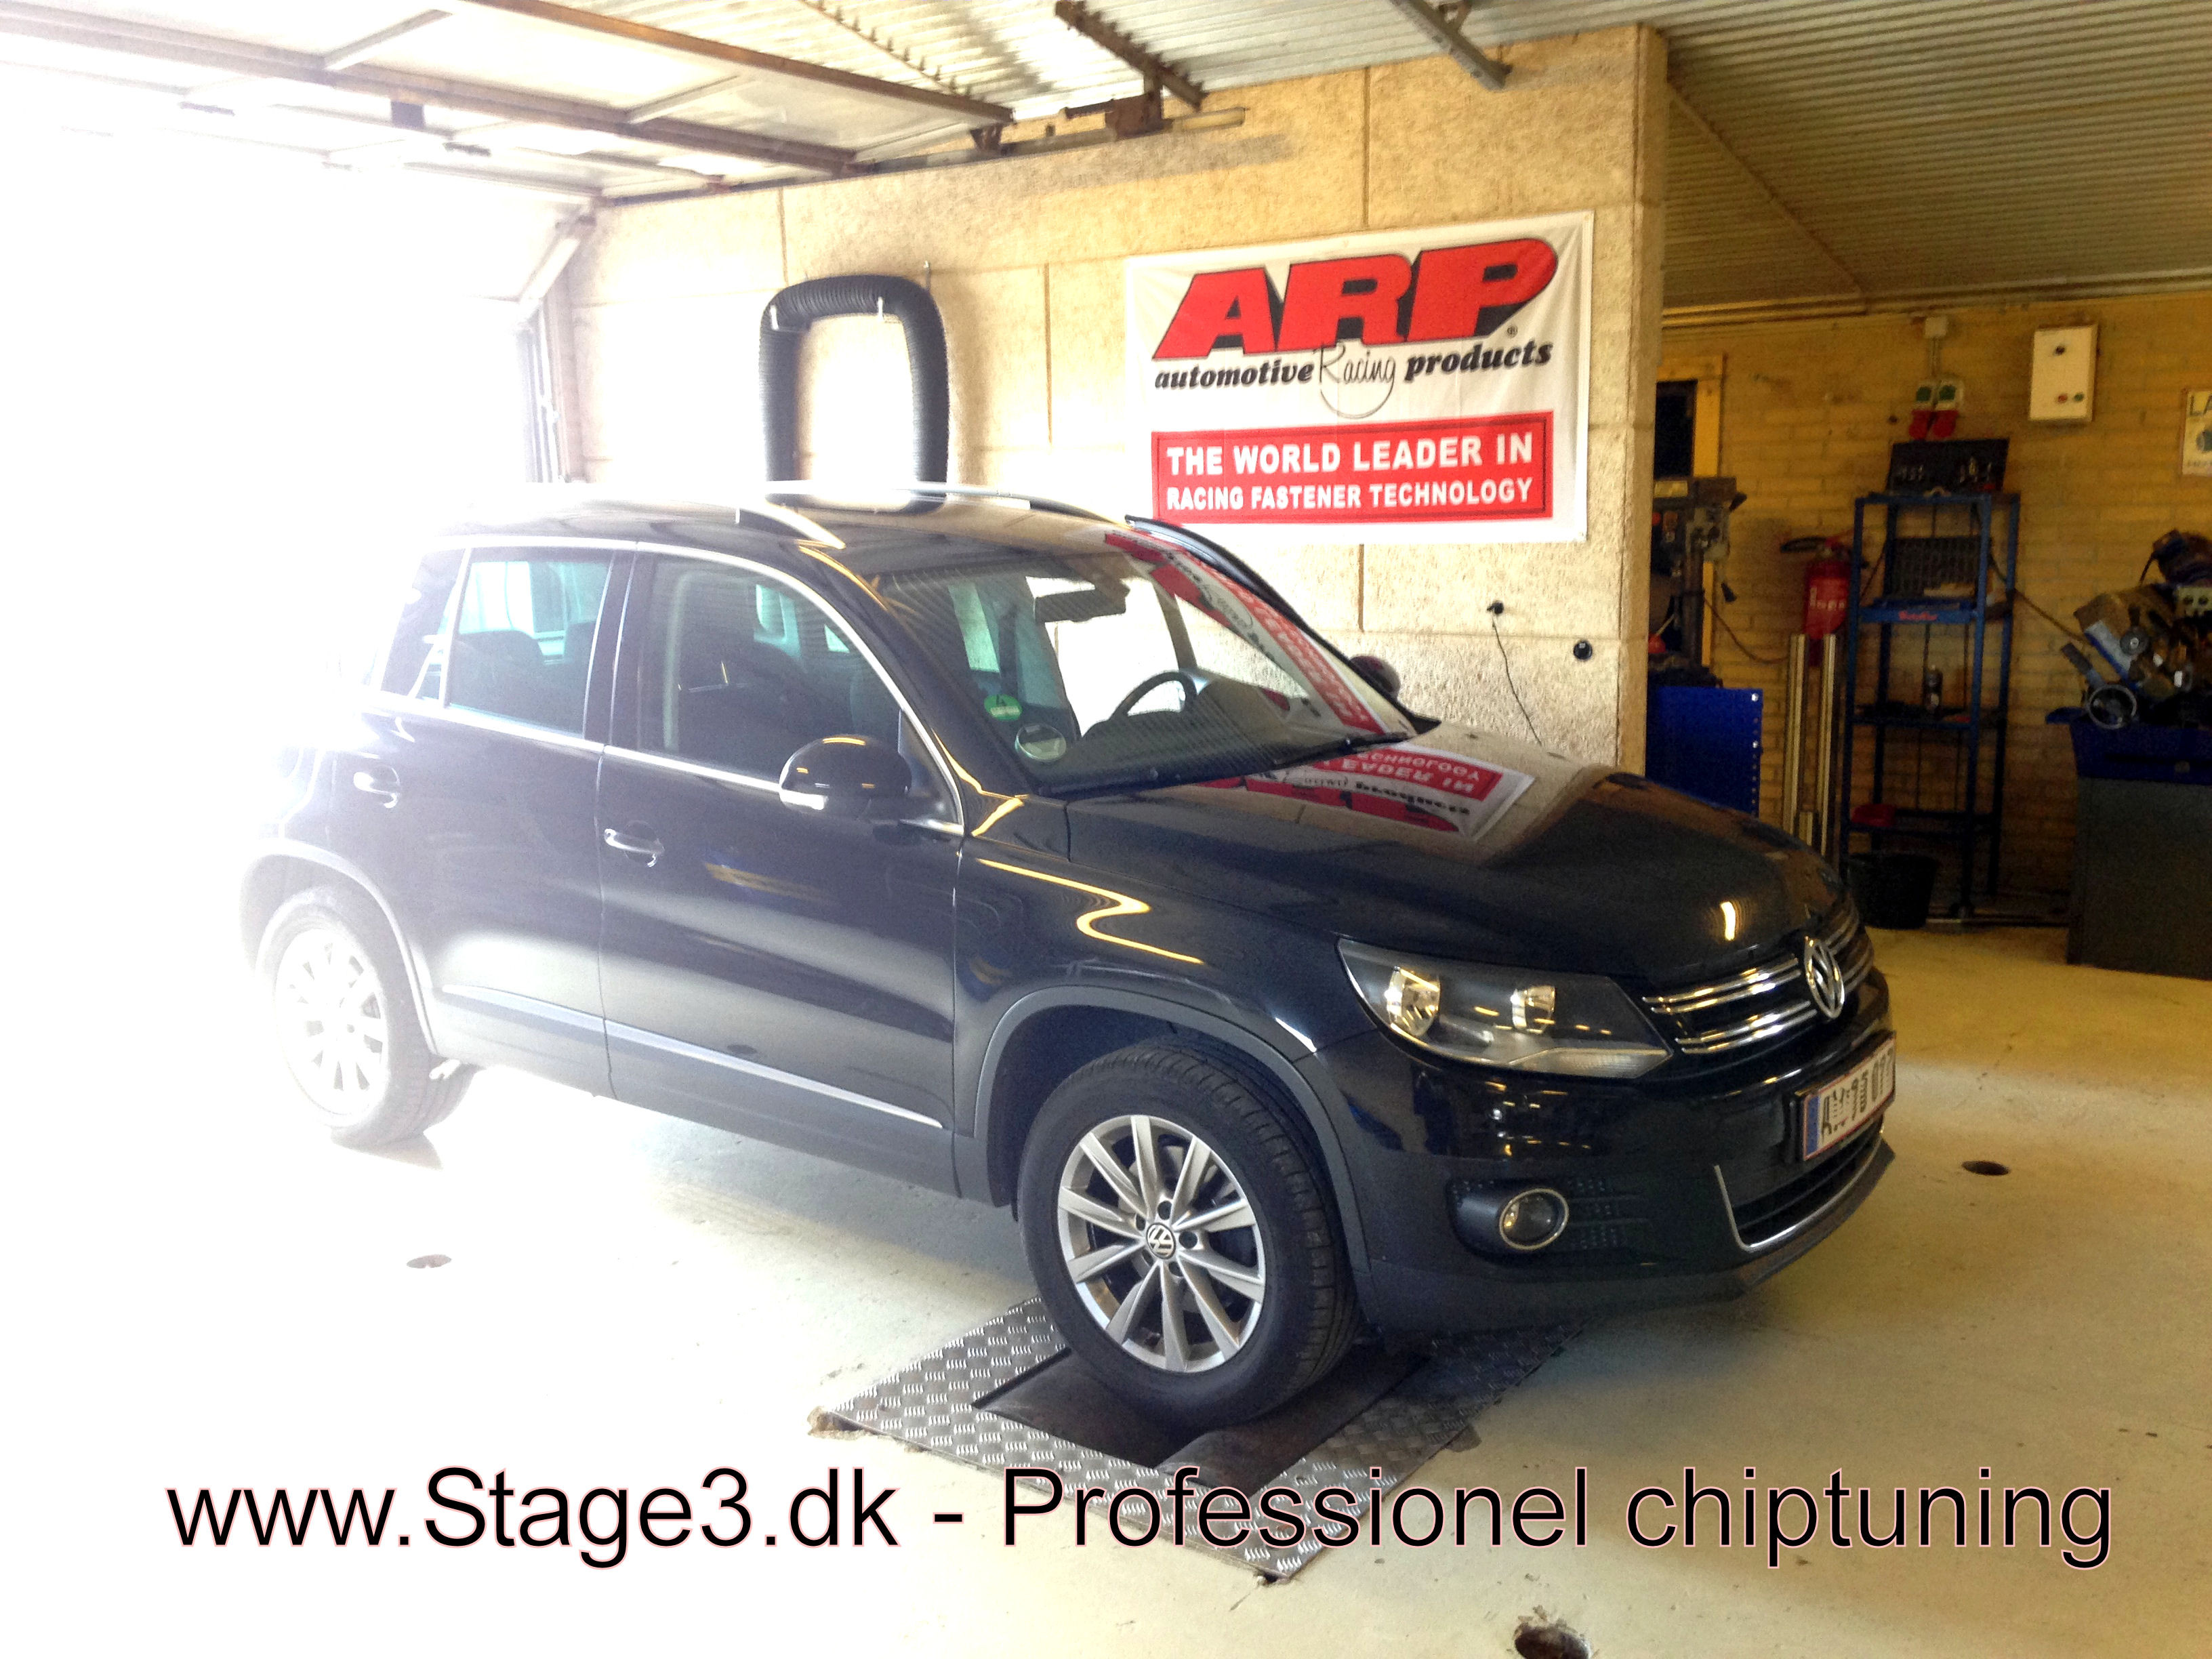 VW Tiguan 2_0 TDI 140 HK (1)